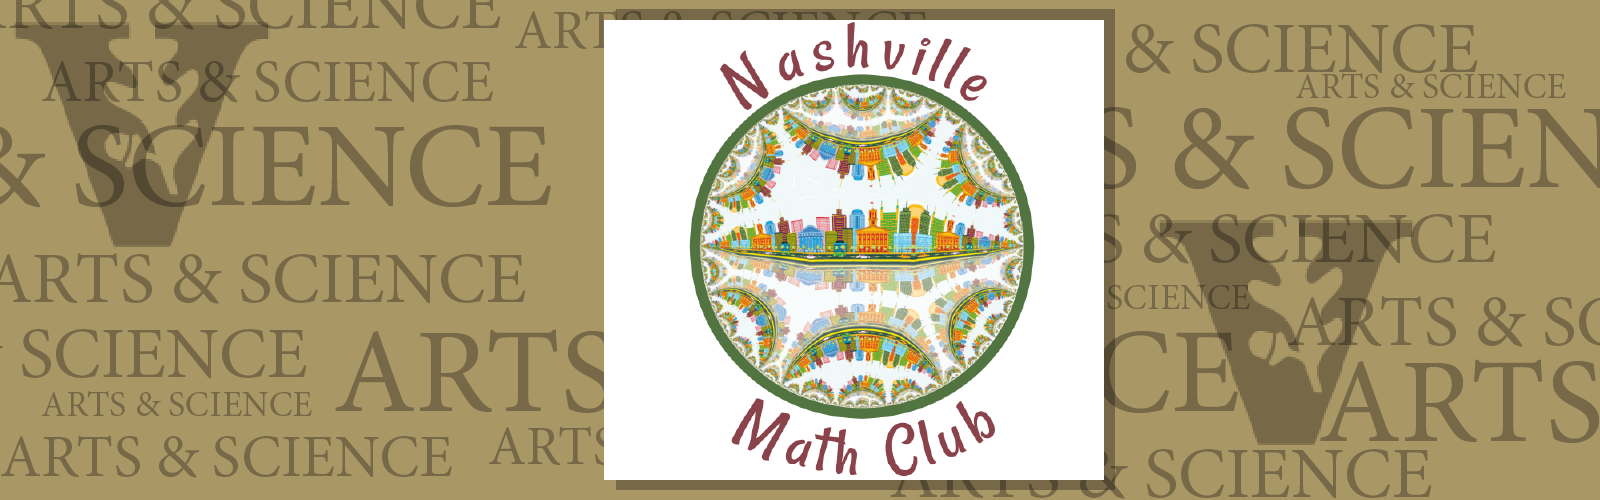 Math professors offer free math club for Nashville 6-12th graders